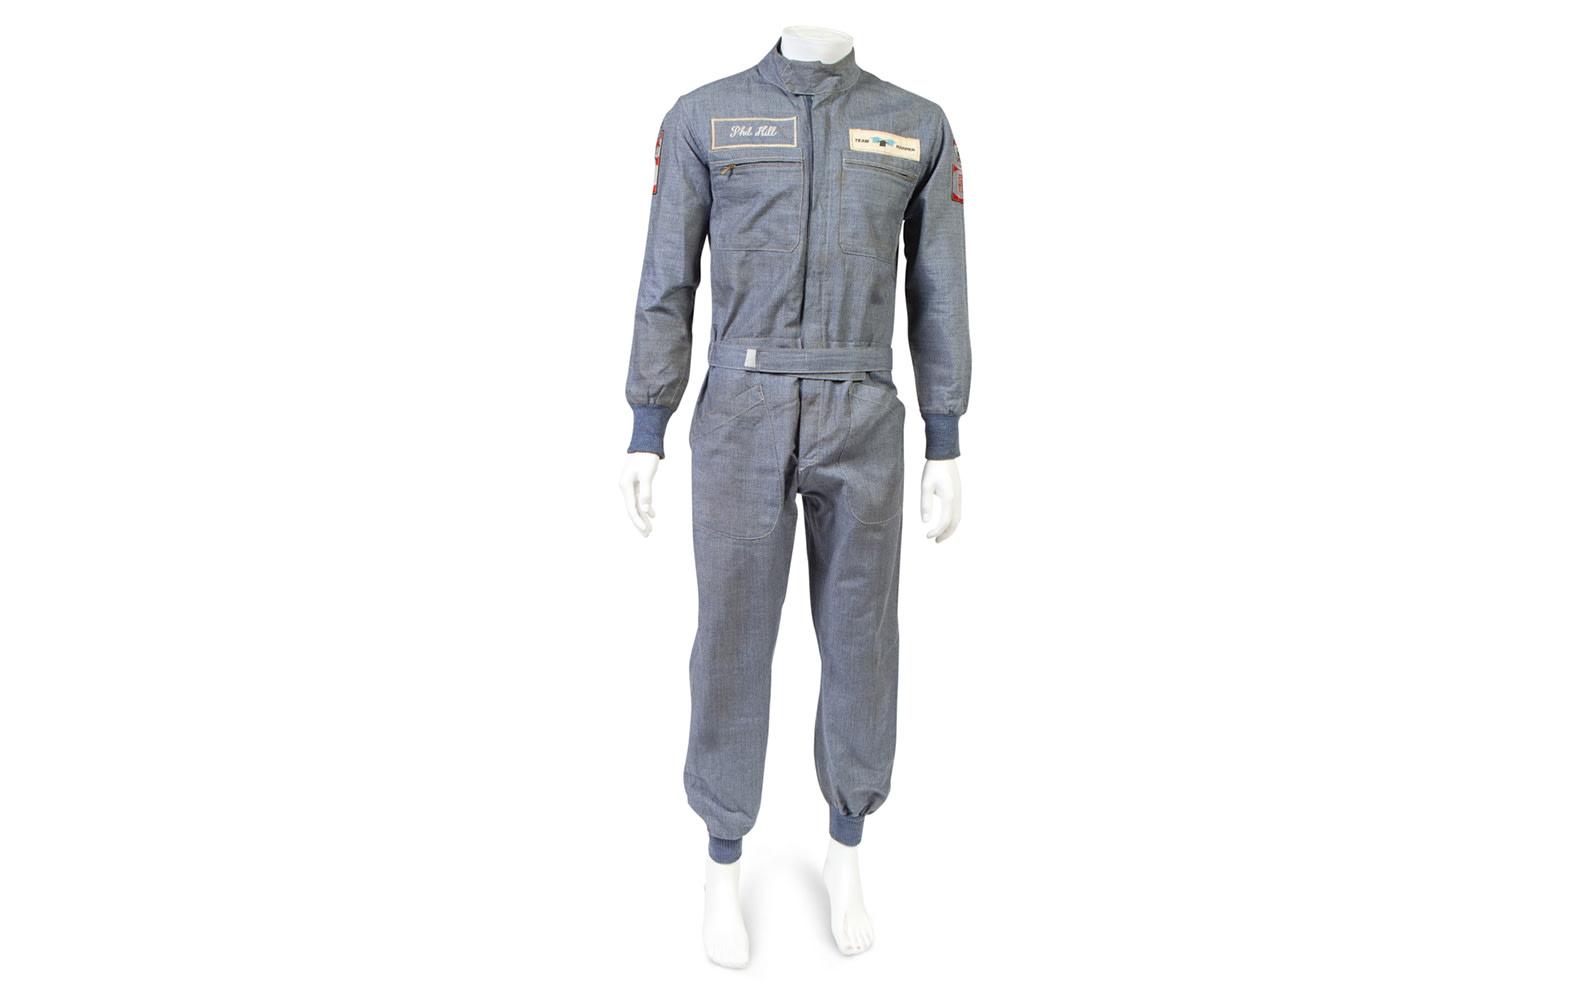 Linea Sport One-Piece Driving Suit